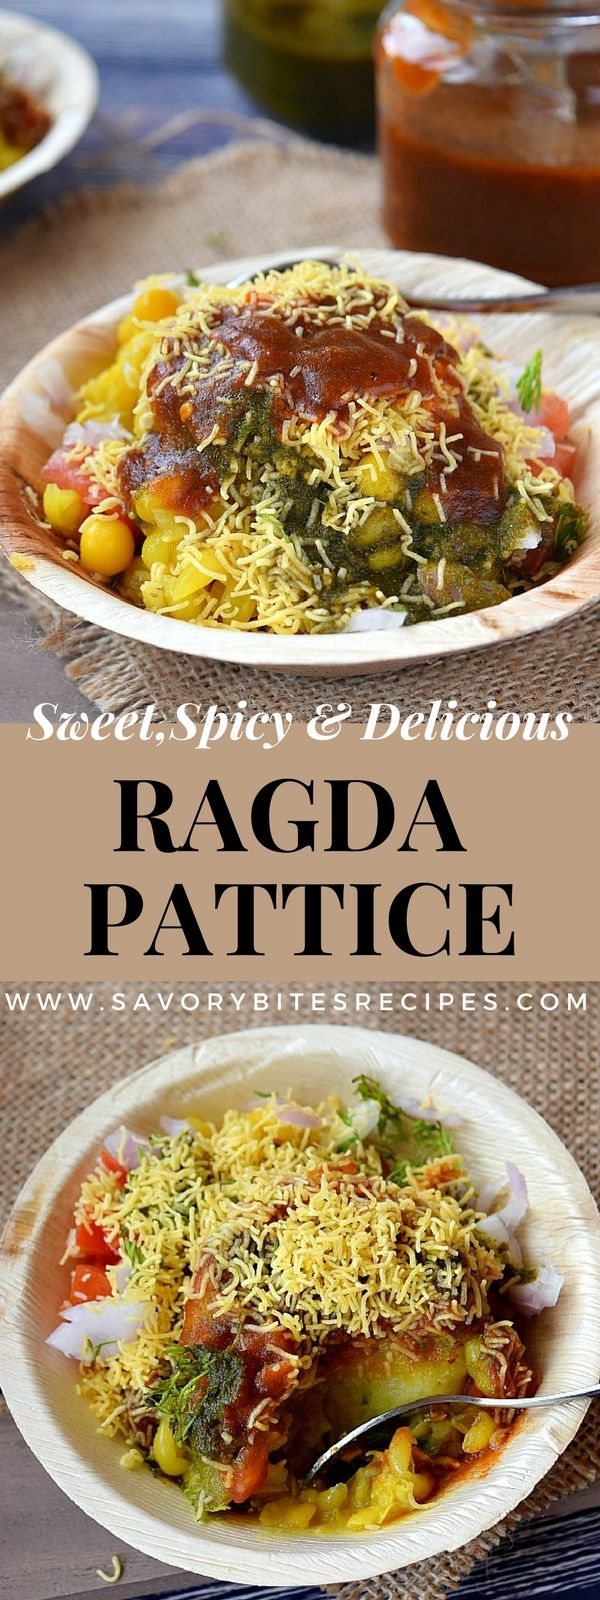 Ragda pattice street food recipe indian street food street indian street food at its best ragda pattice ragdapattice vegetarian recipe forumfinder Images